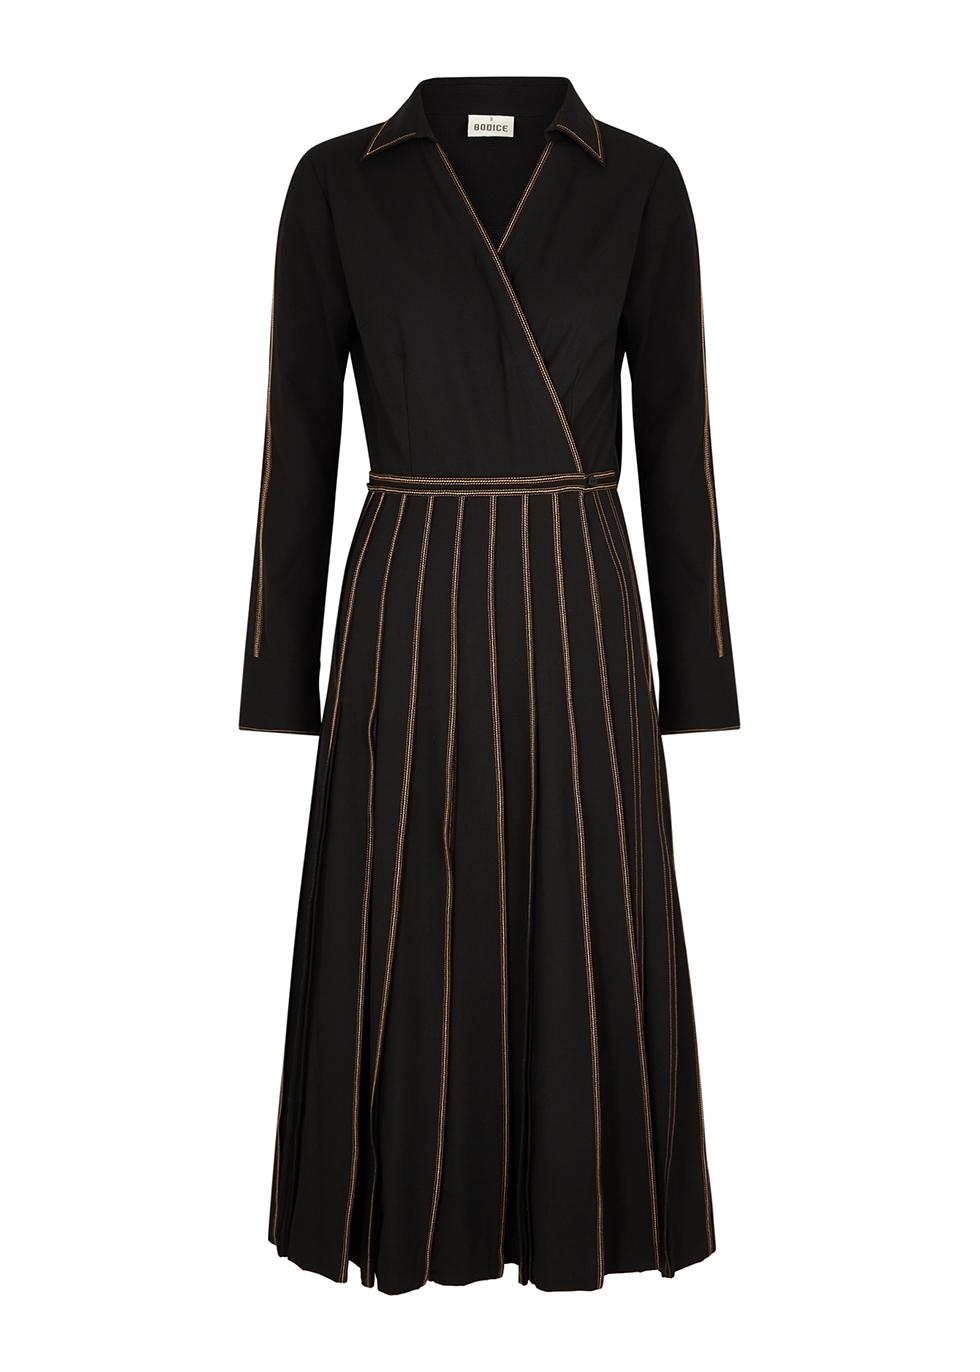 Black pleated woven wrap dress